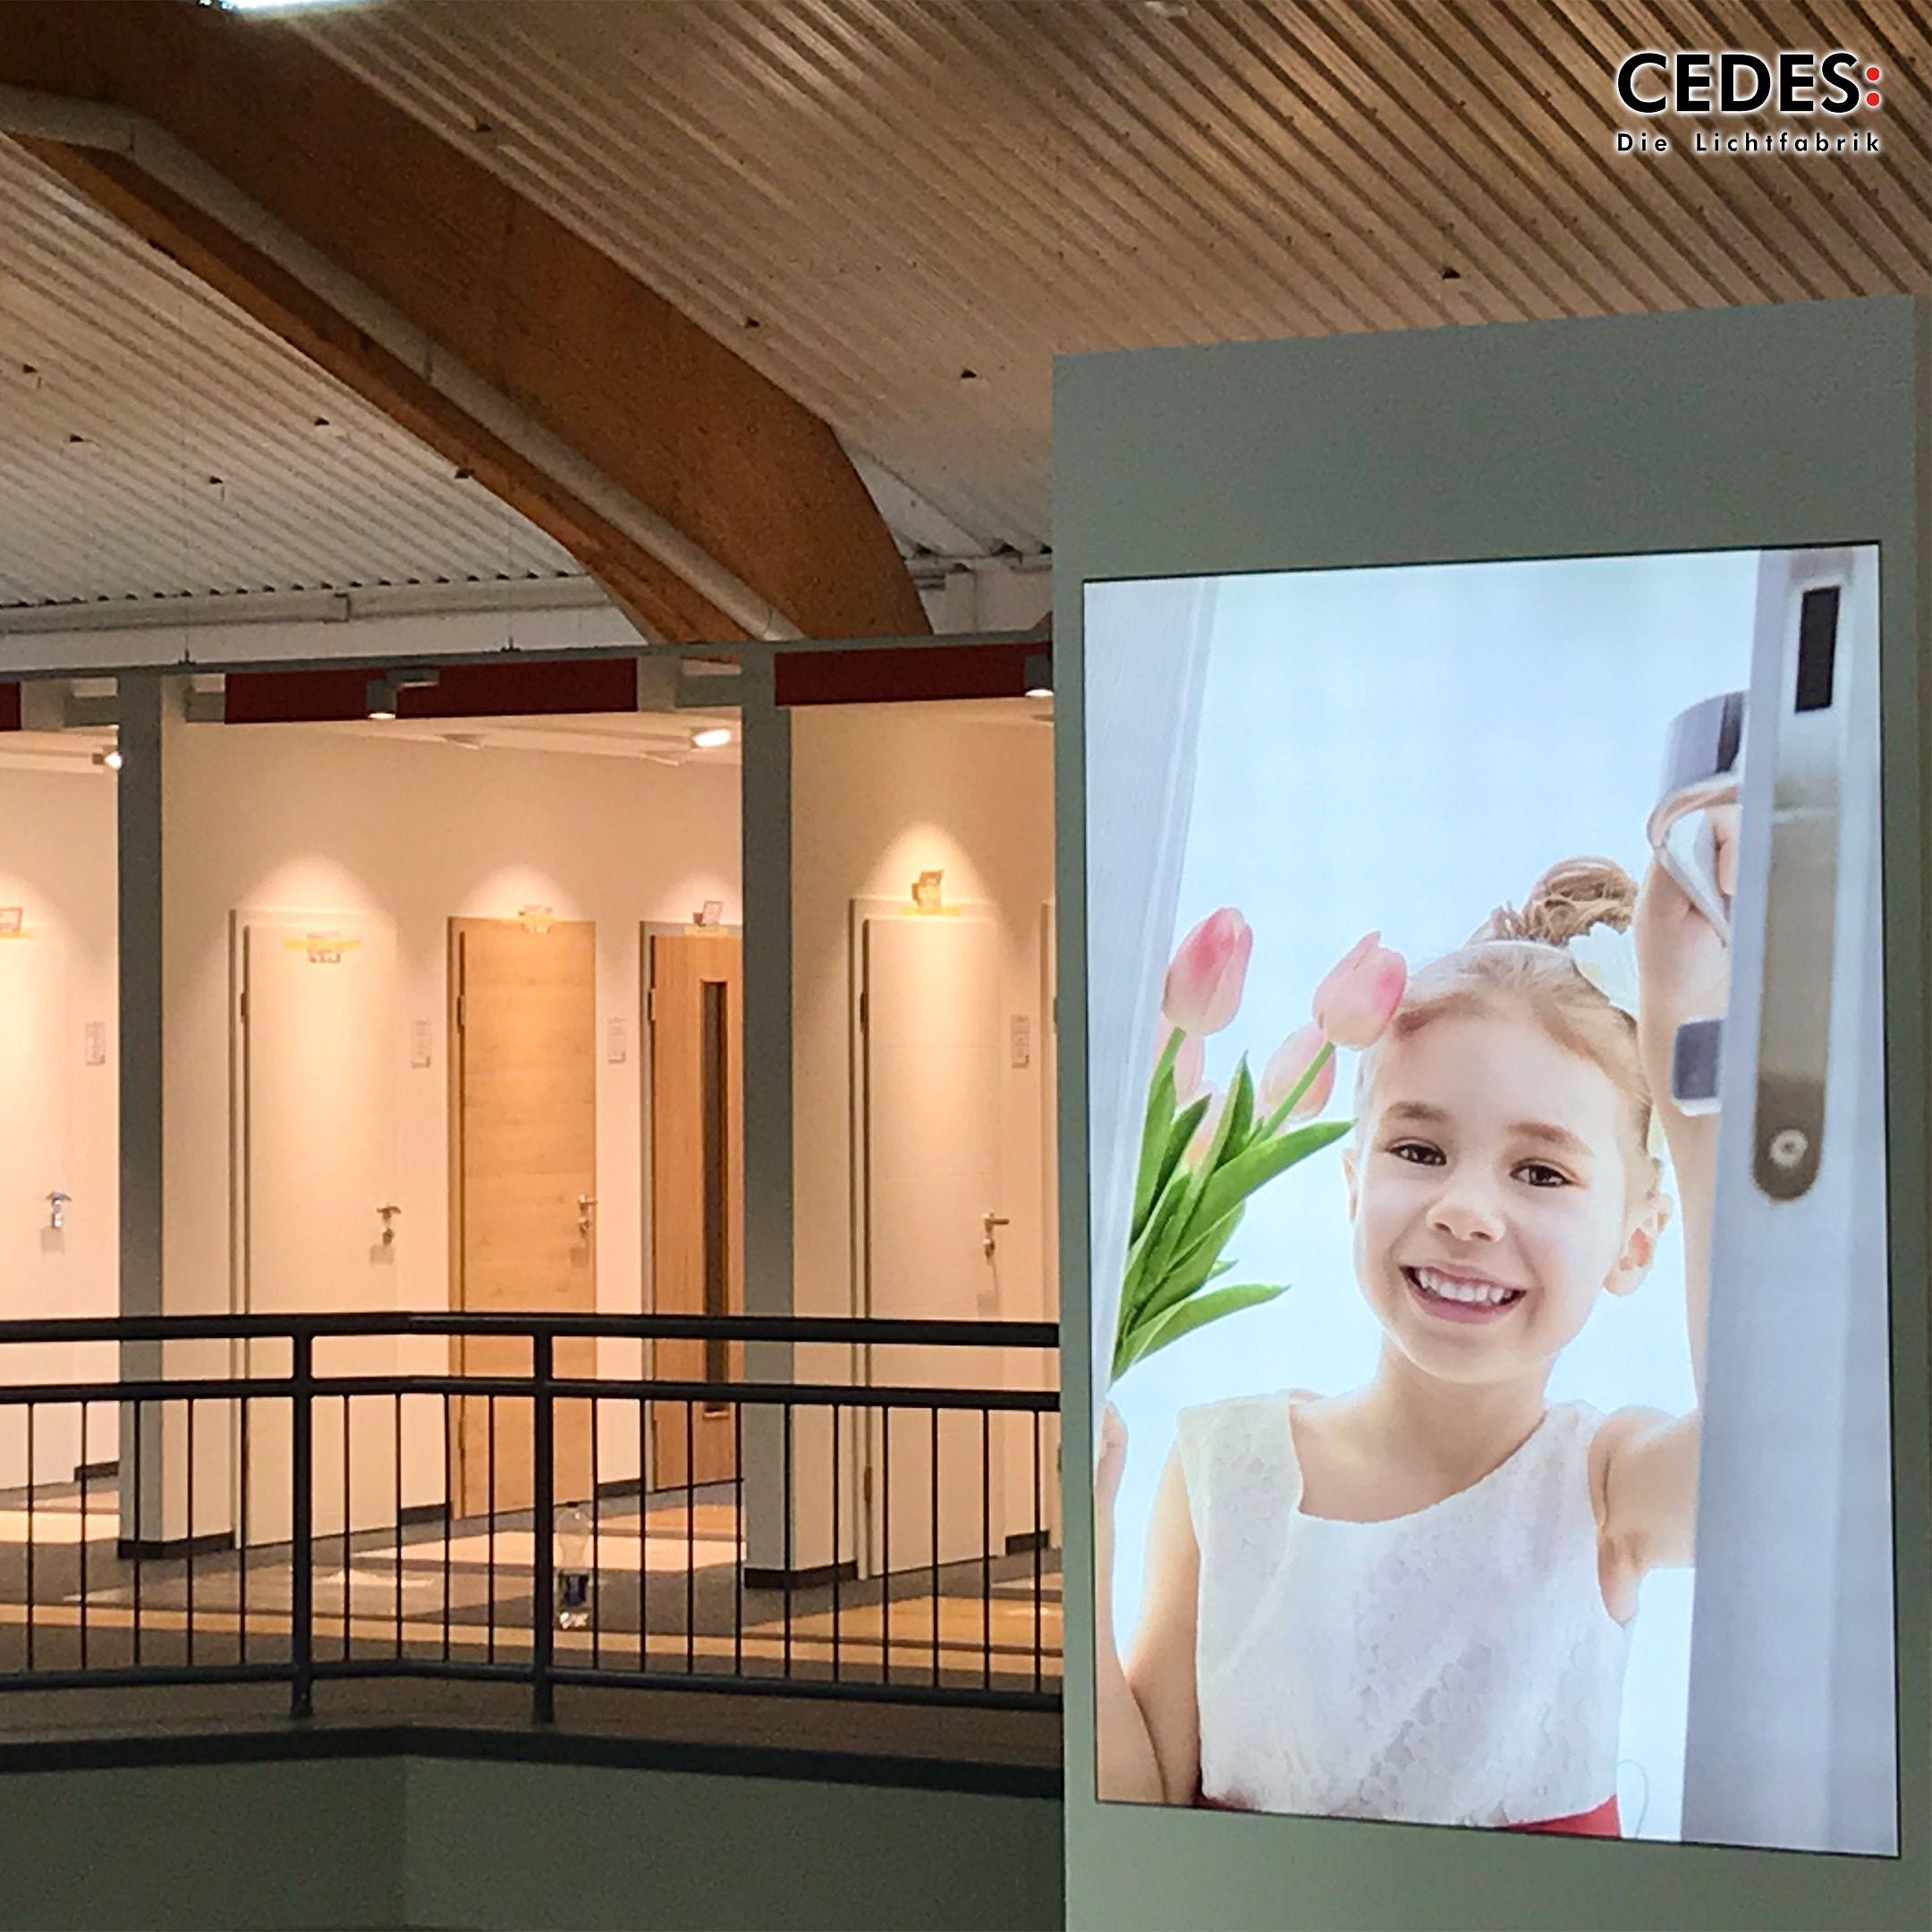 Smart Retail Lighting Led Lighting Frames Provide Emotion And Guidance Lichtplanung Ladenbau Beleuchtung